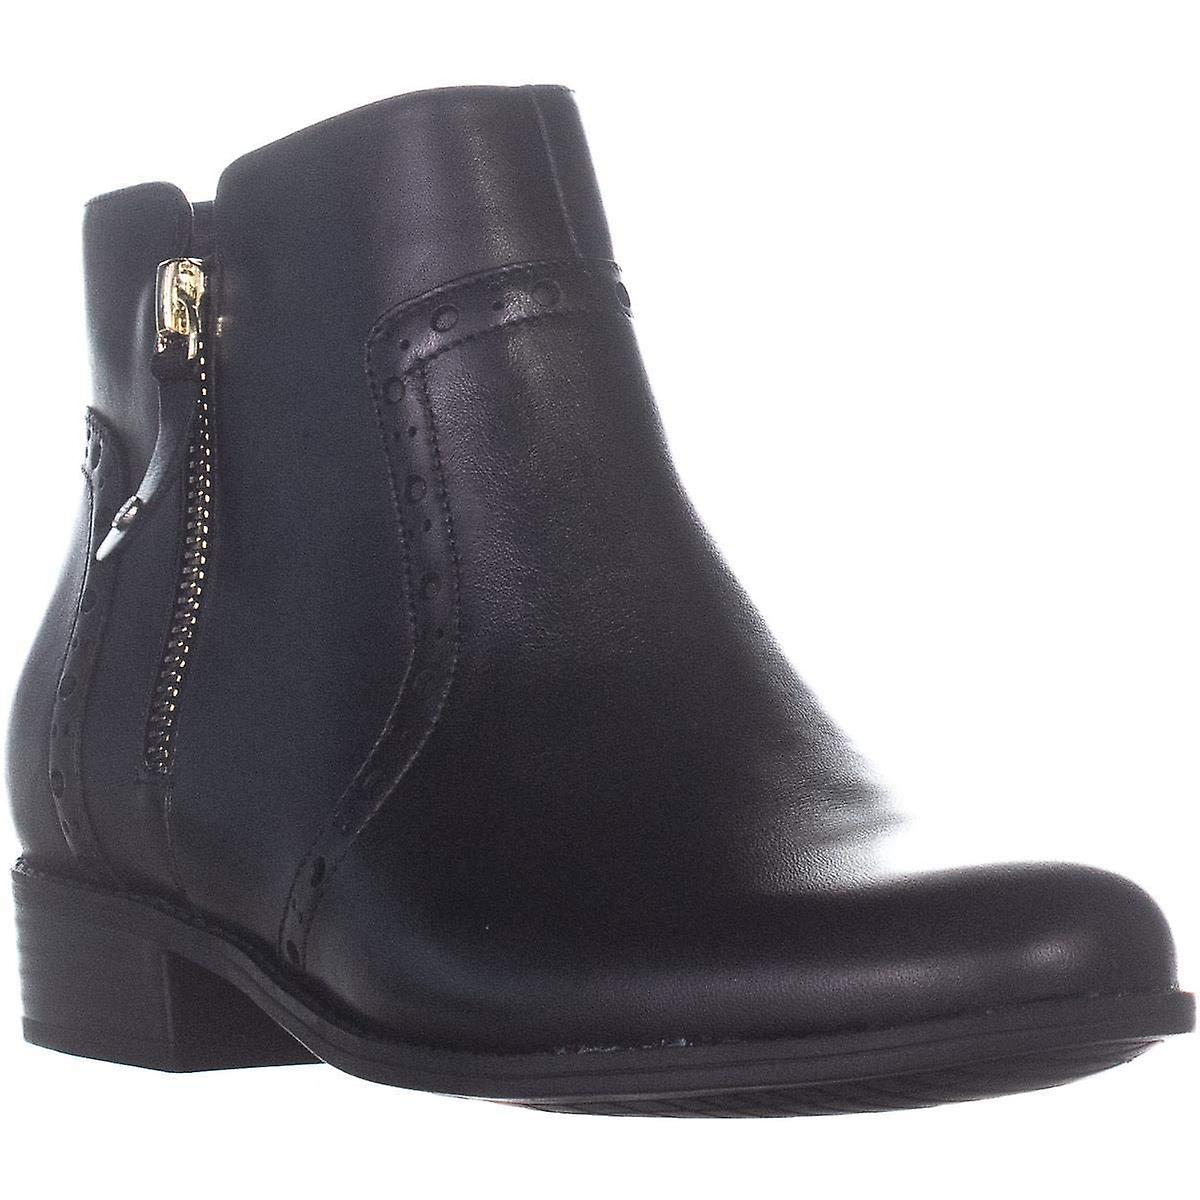 Giani Bernini Womens Nieve Leather Round Toe Ankle Fashion Boots